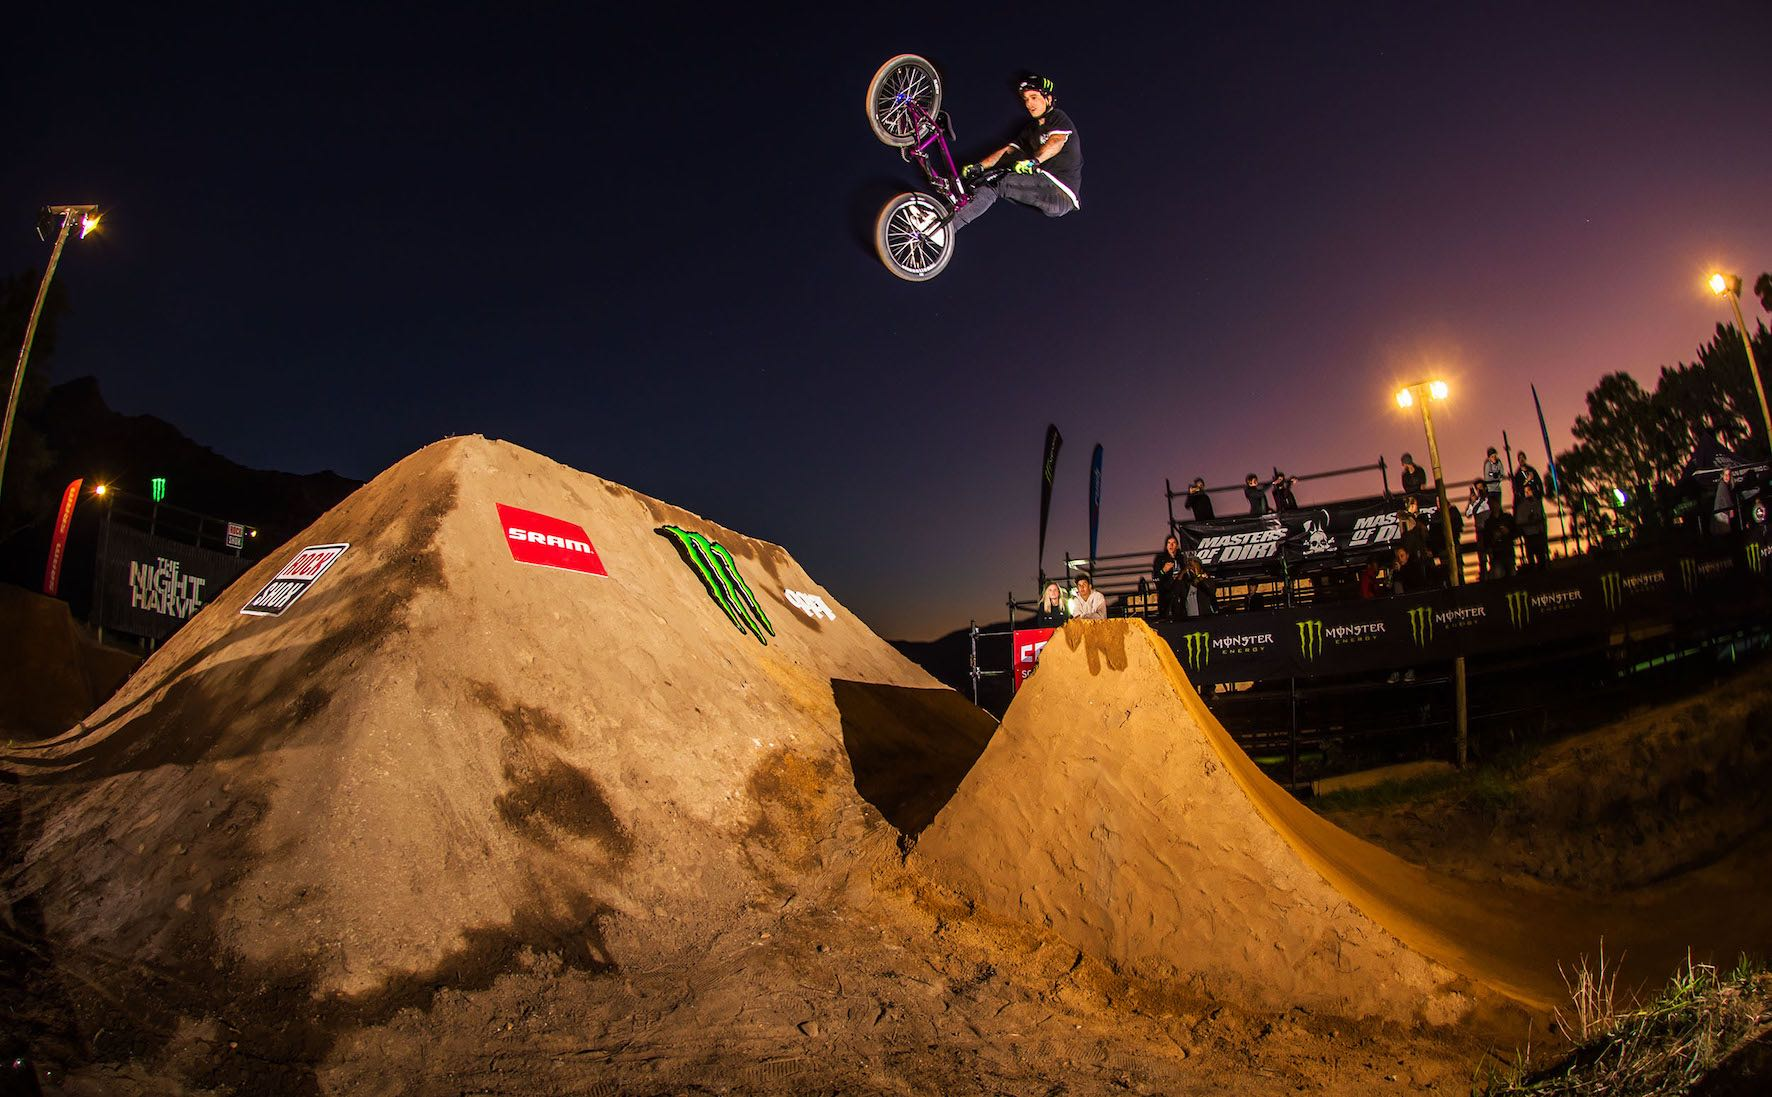 Kyle Baldock winning the Night Harvest 2018 BMX event